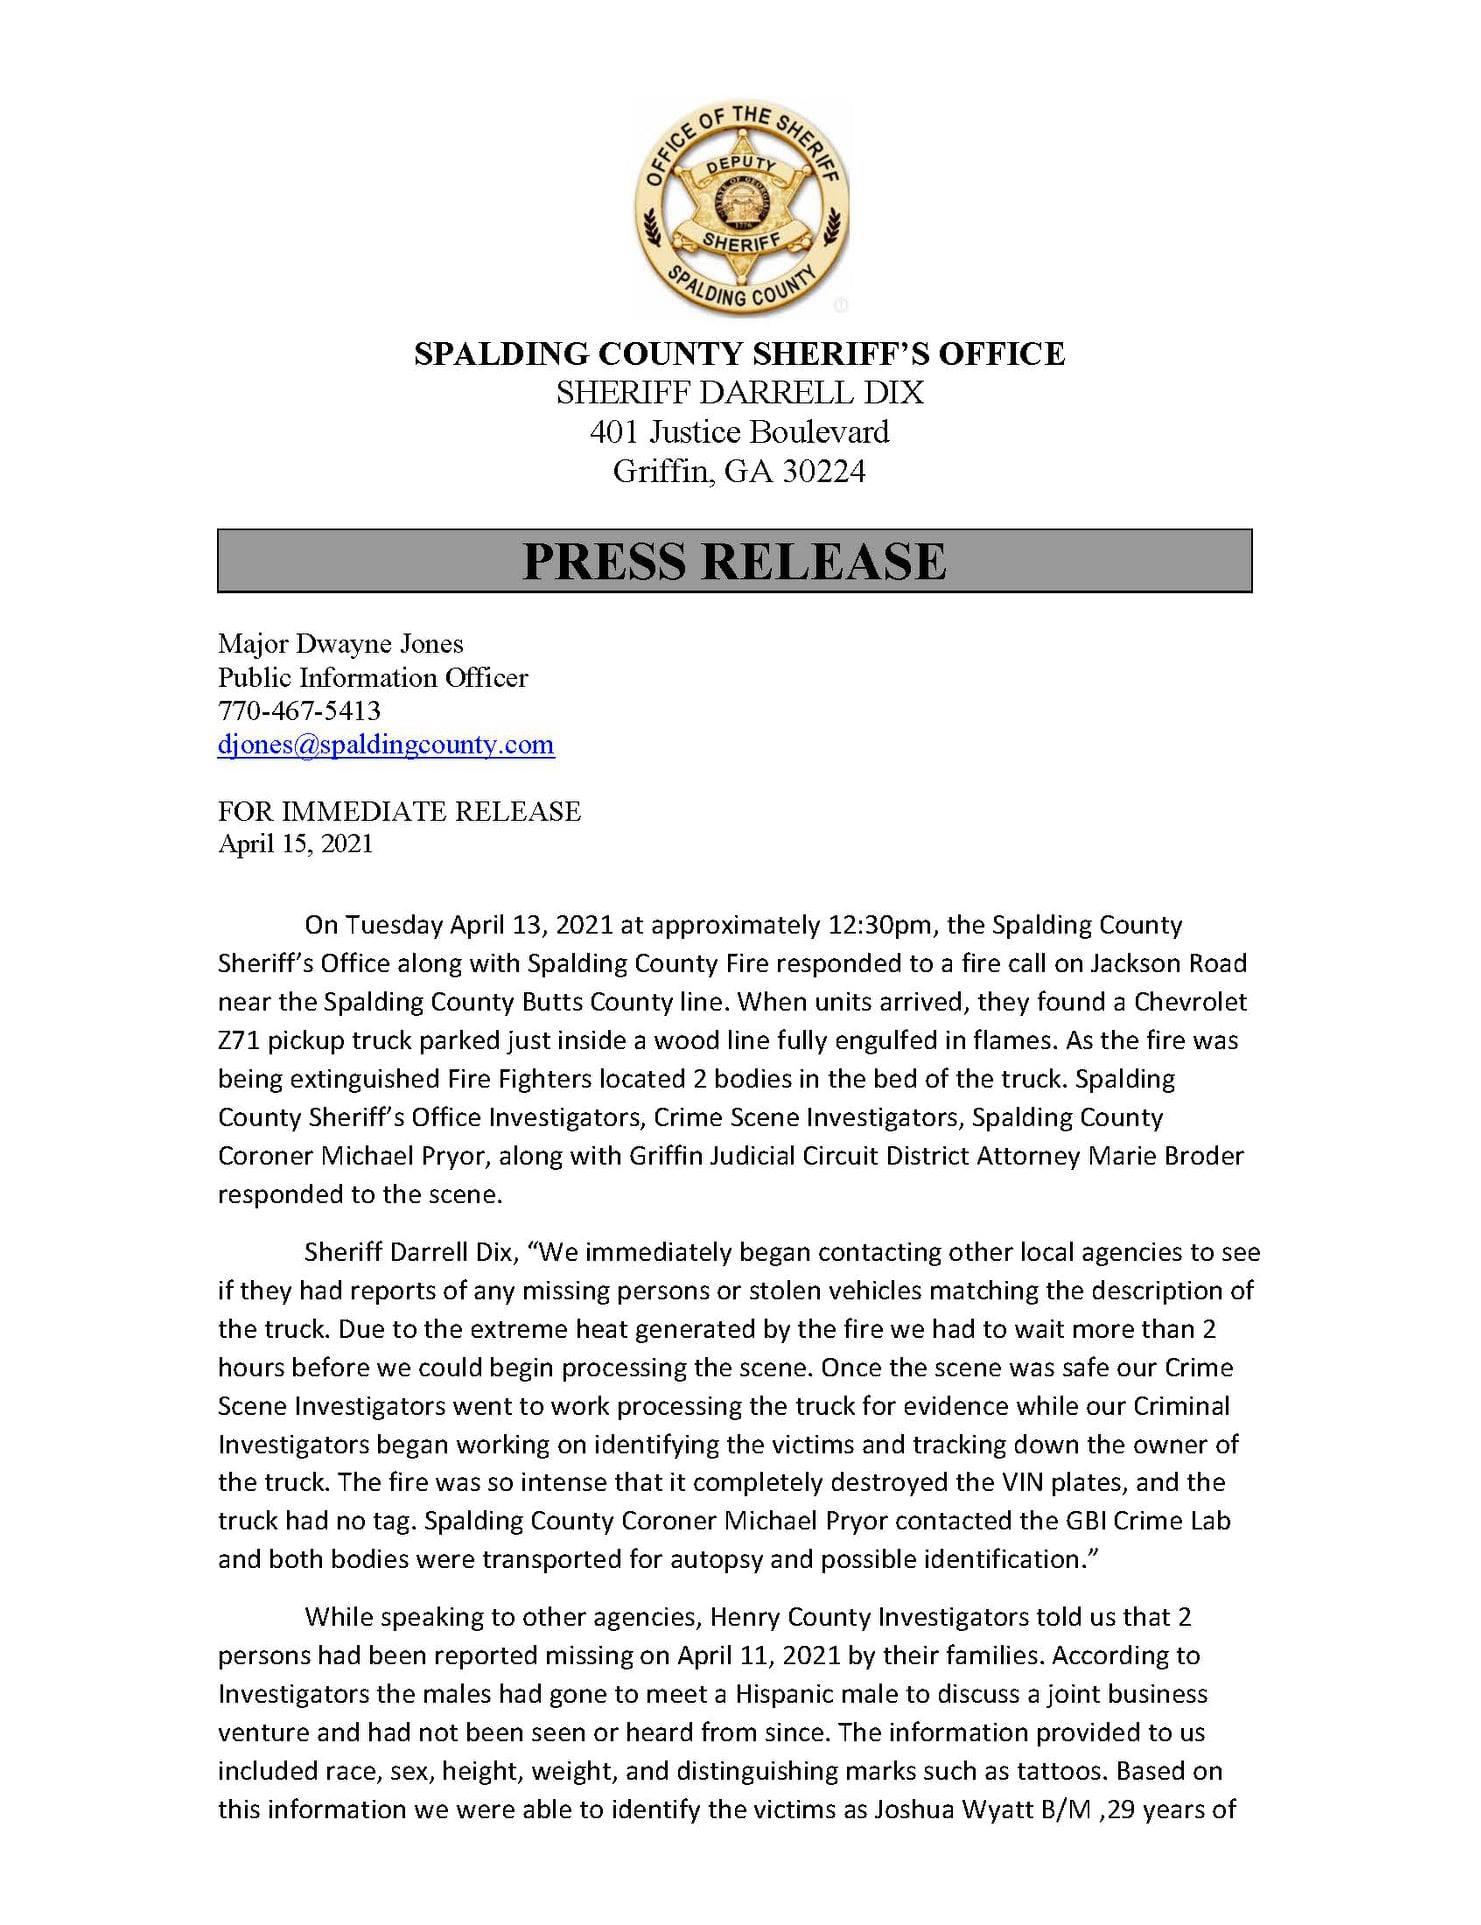 spalding county press release murder arrest 04142021 – 1